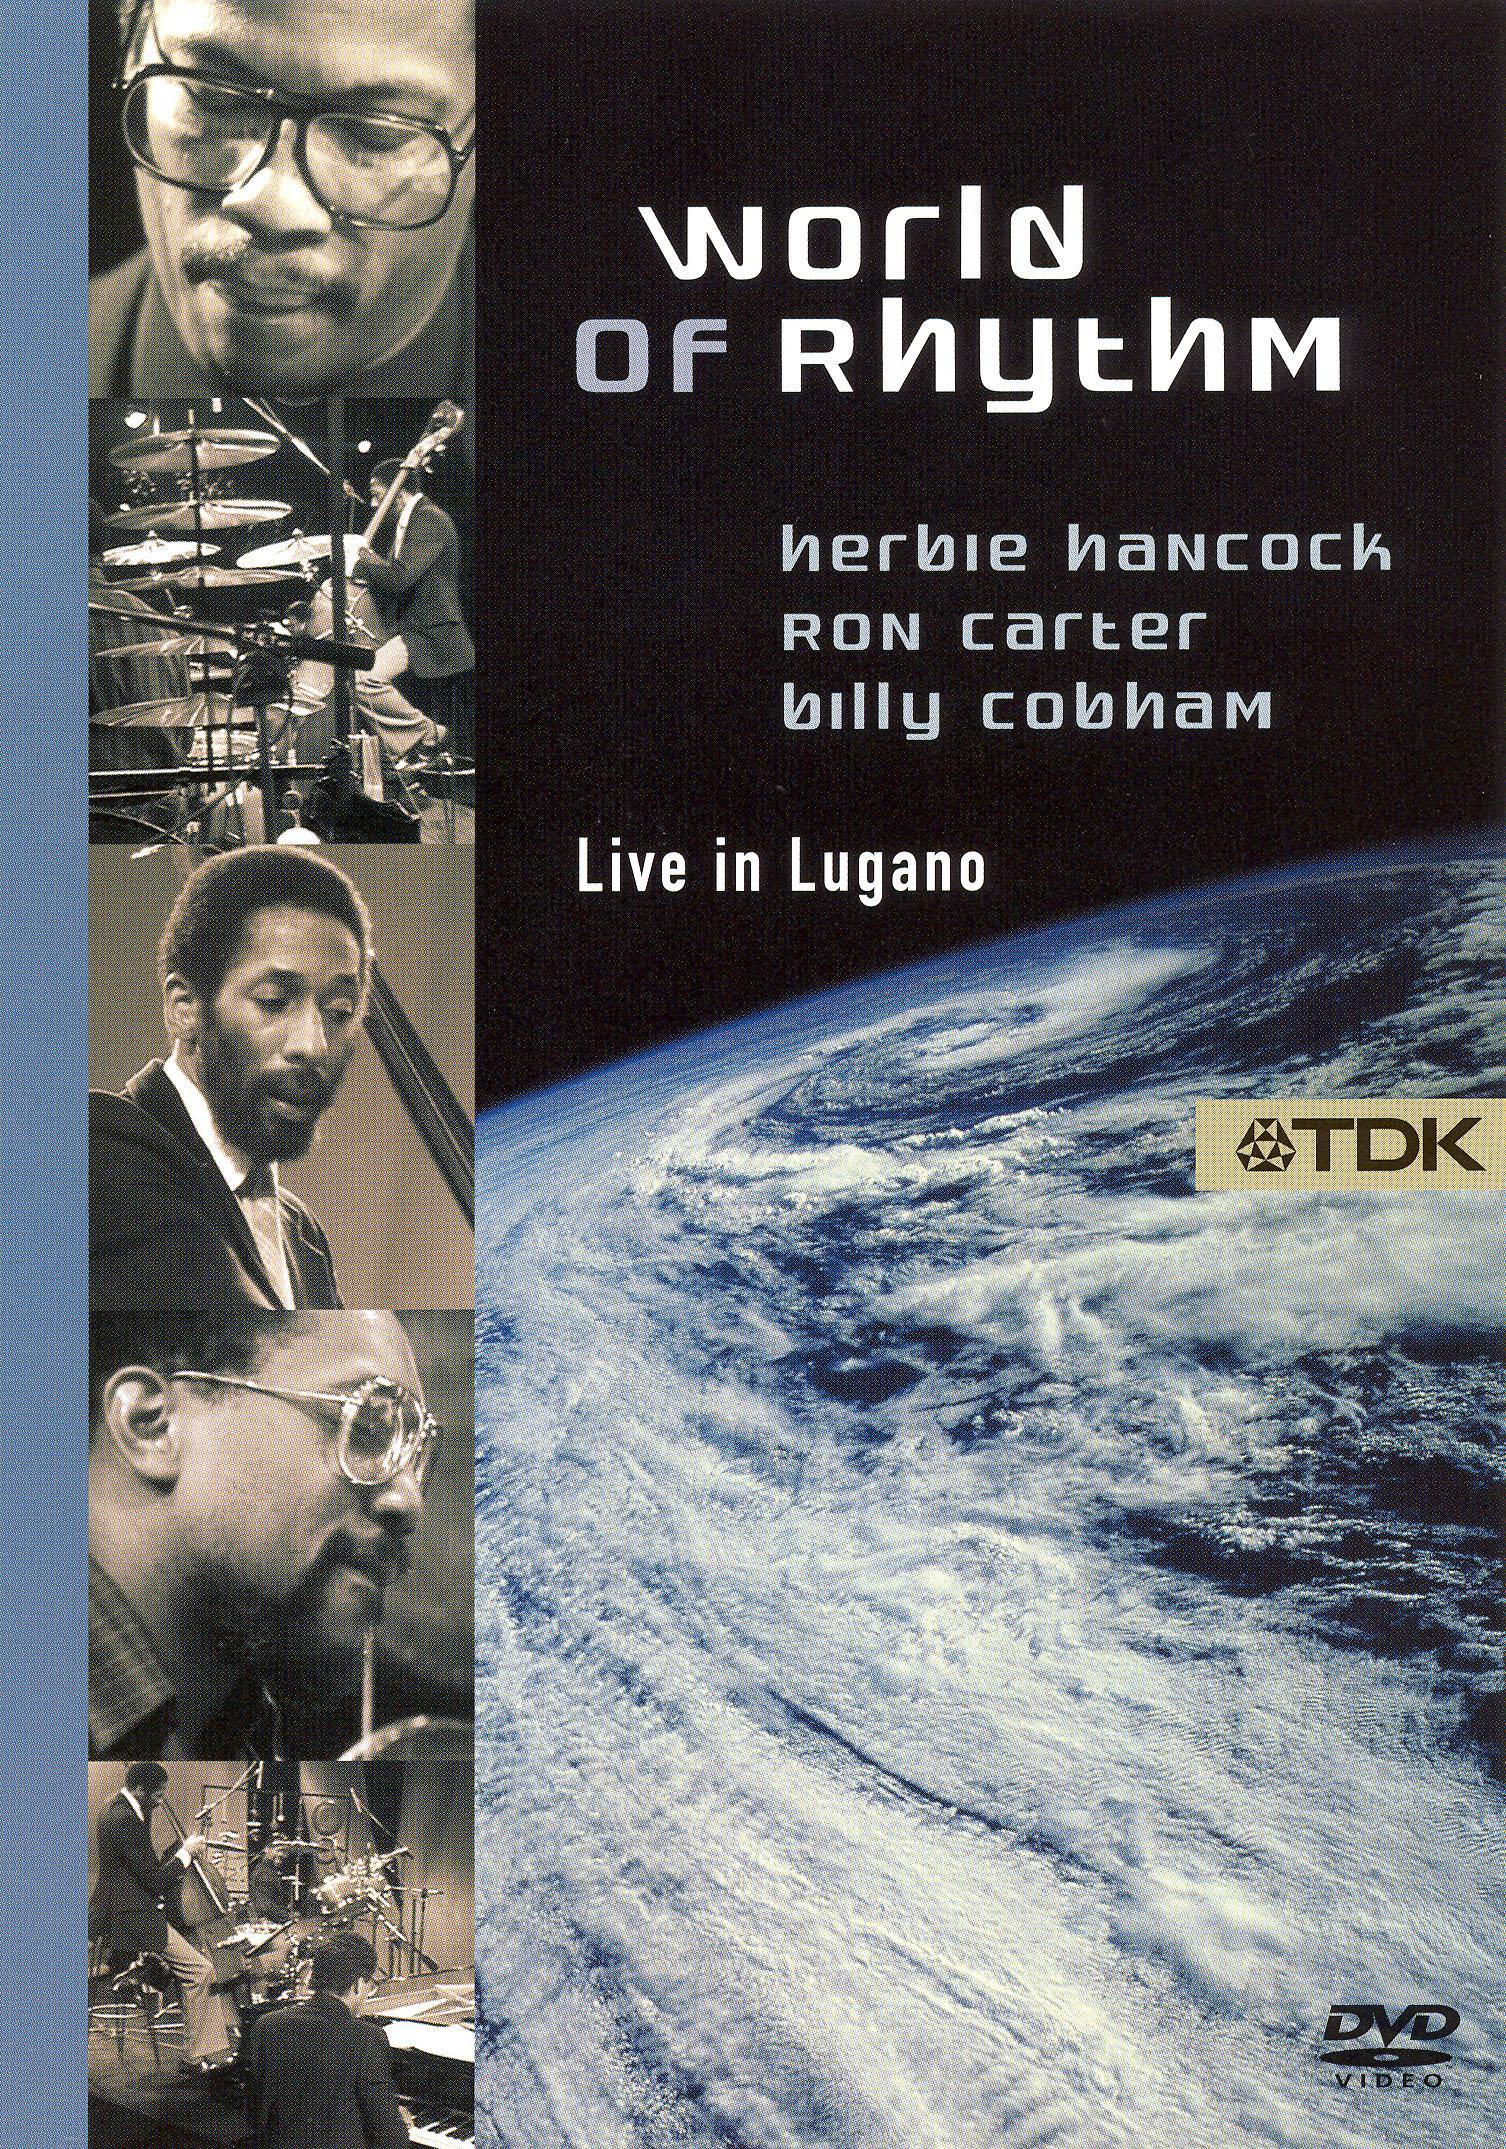 World of Rhythm Live